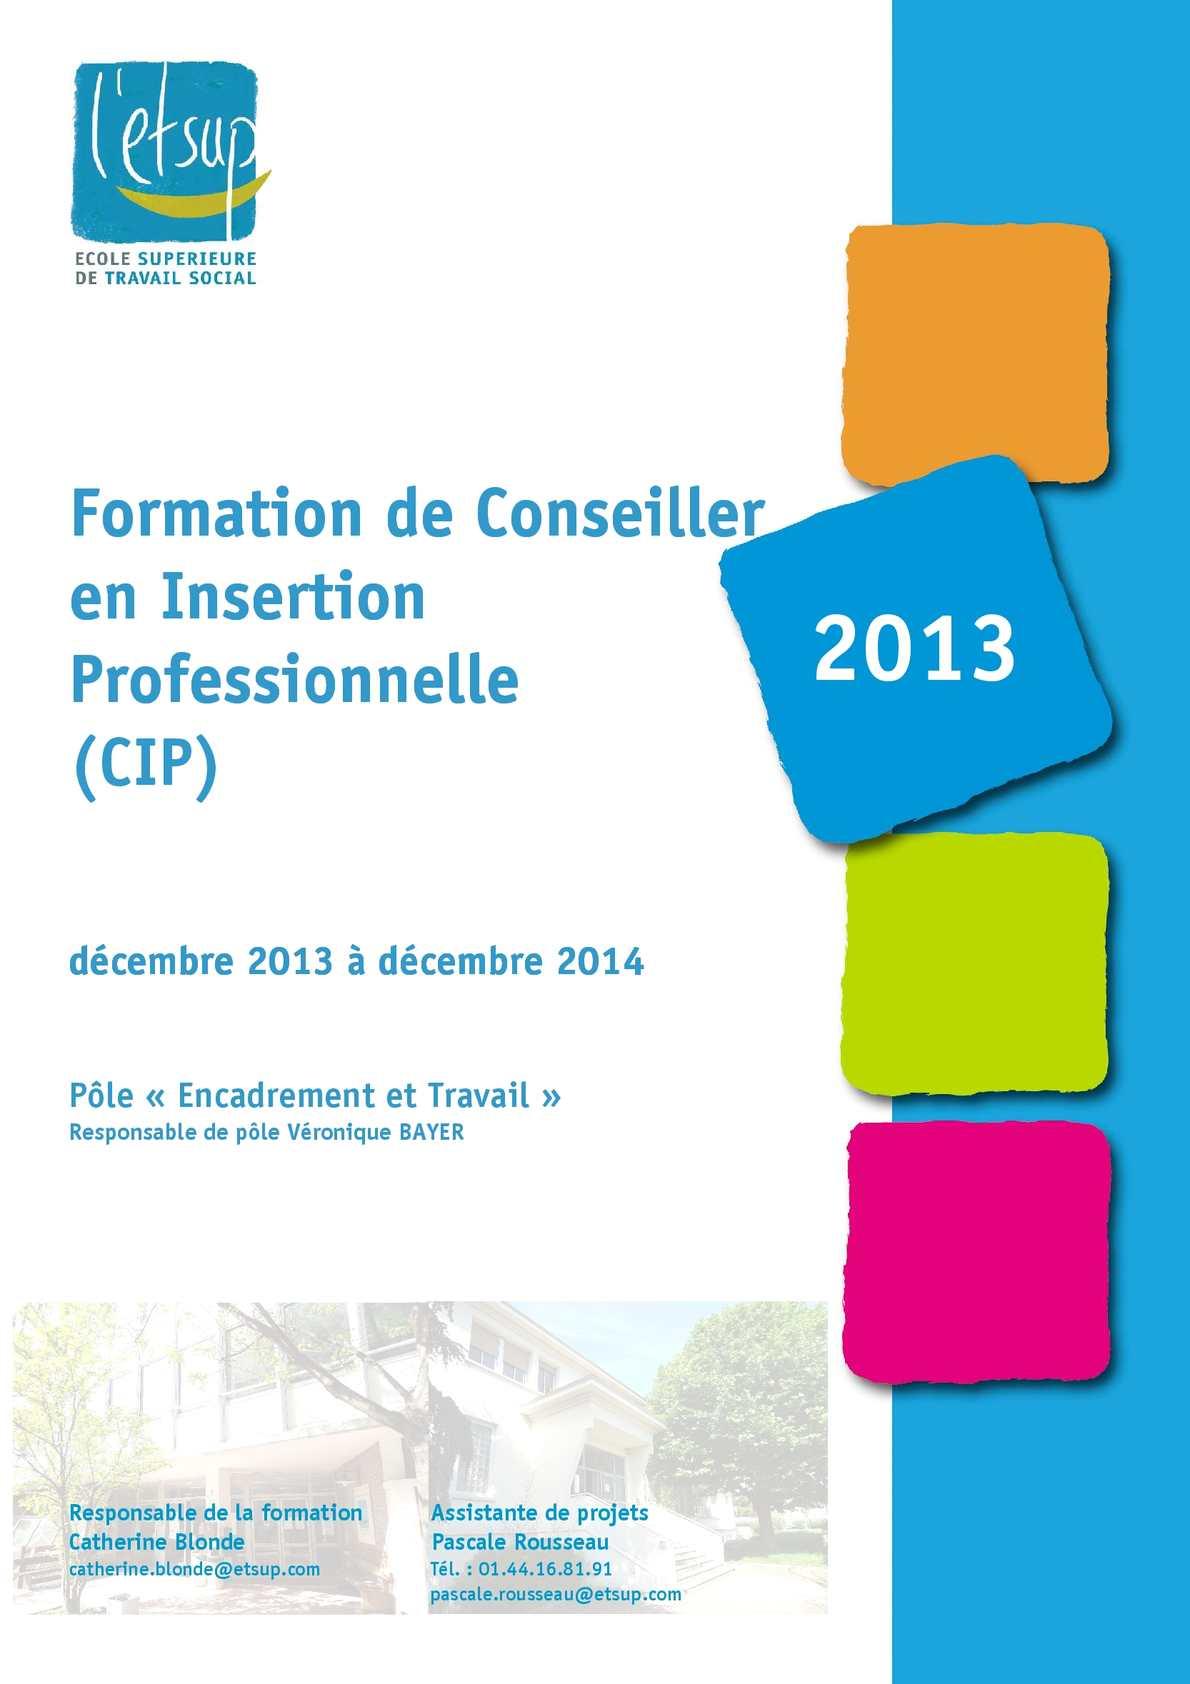 Favori Calaméo - Plaquette CIP 2013 - sept 203 YS31